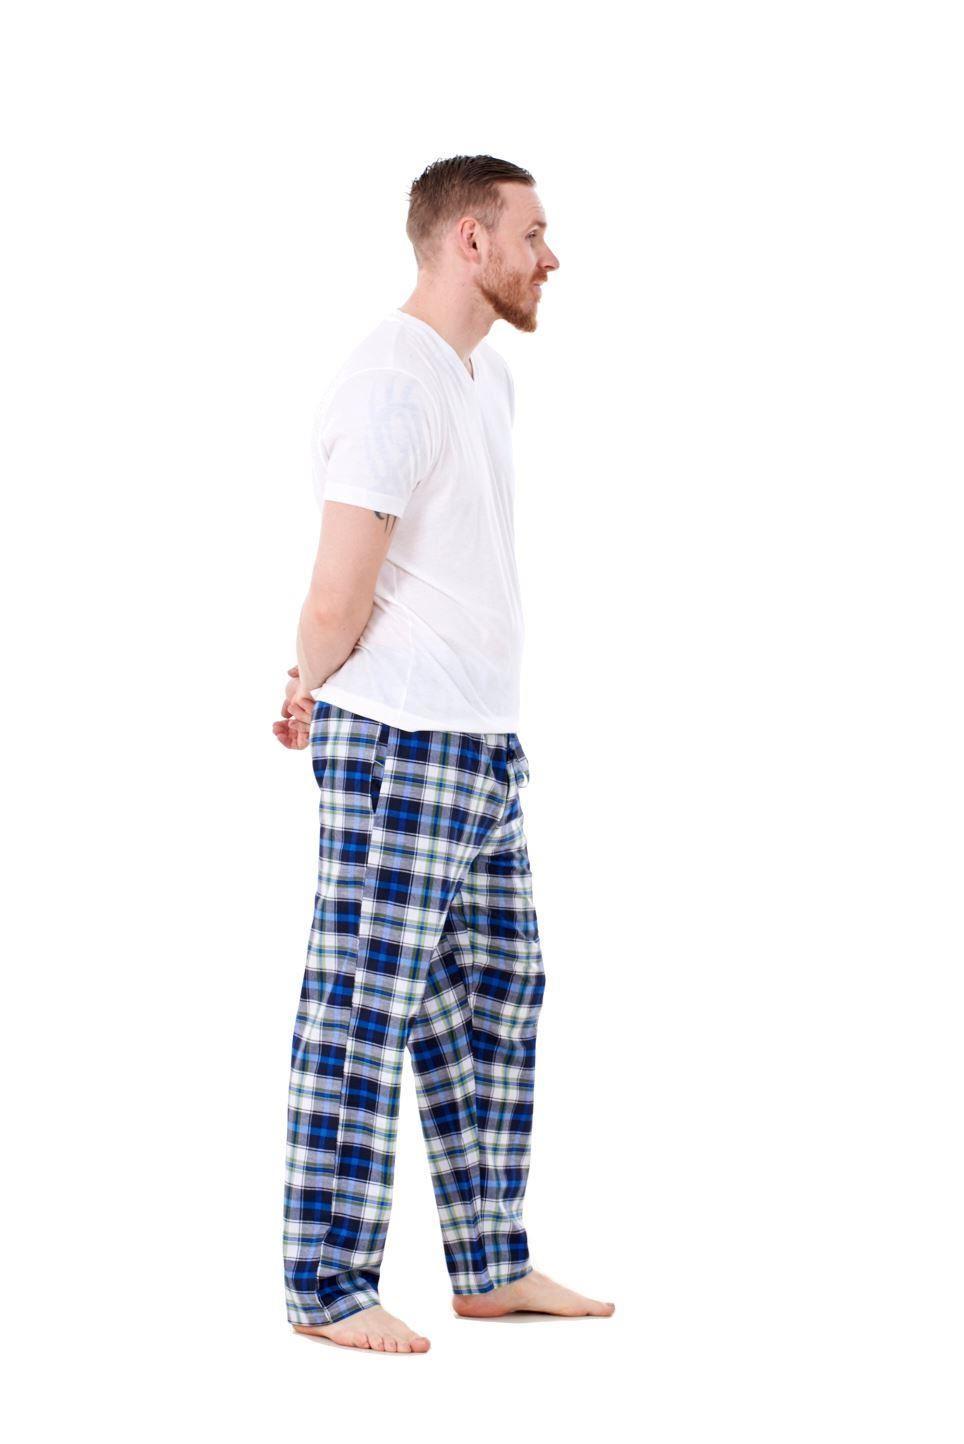 Mens-Pyjama-Bottoms-Rich-Cotton-Woven-Check-Lounge-Pant-Nightwear-Big-3XL-to-5XL Indexbild 44